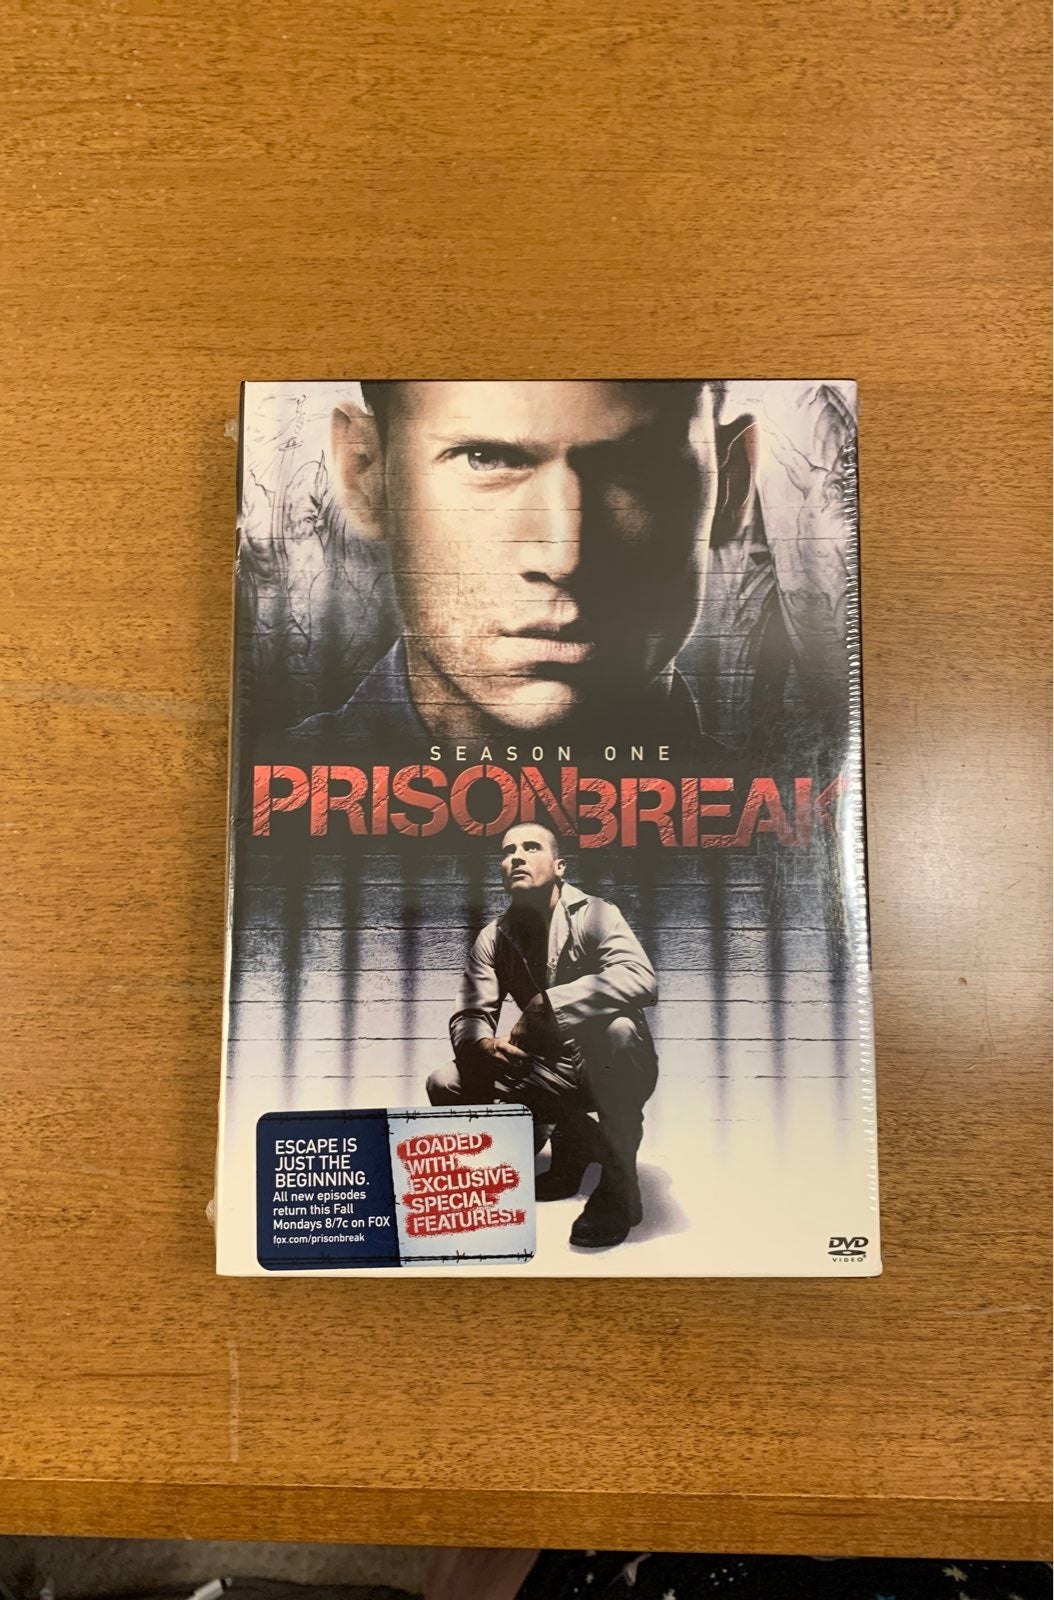 Prison Break Season One DVD